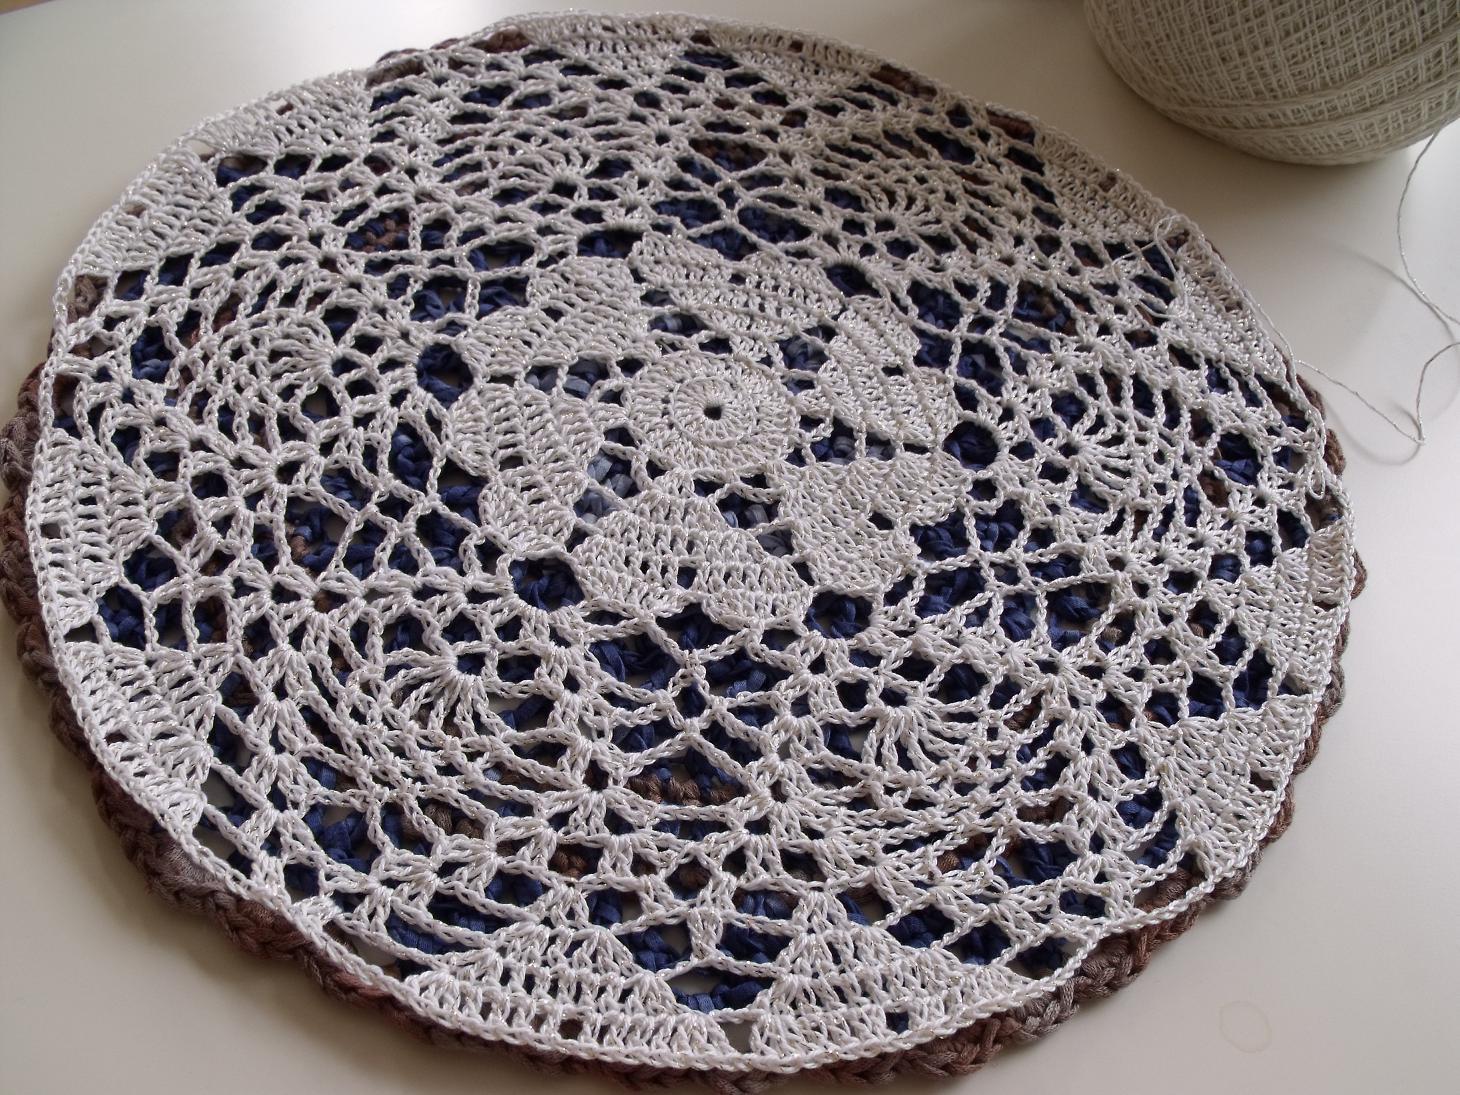 Free Crochet Pattern For Heart Doily : MICROCKNIT CREATIONS: Loving the Hearts - Crochet Doily ...